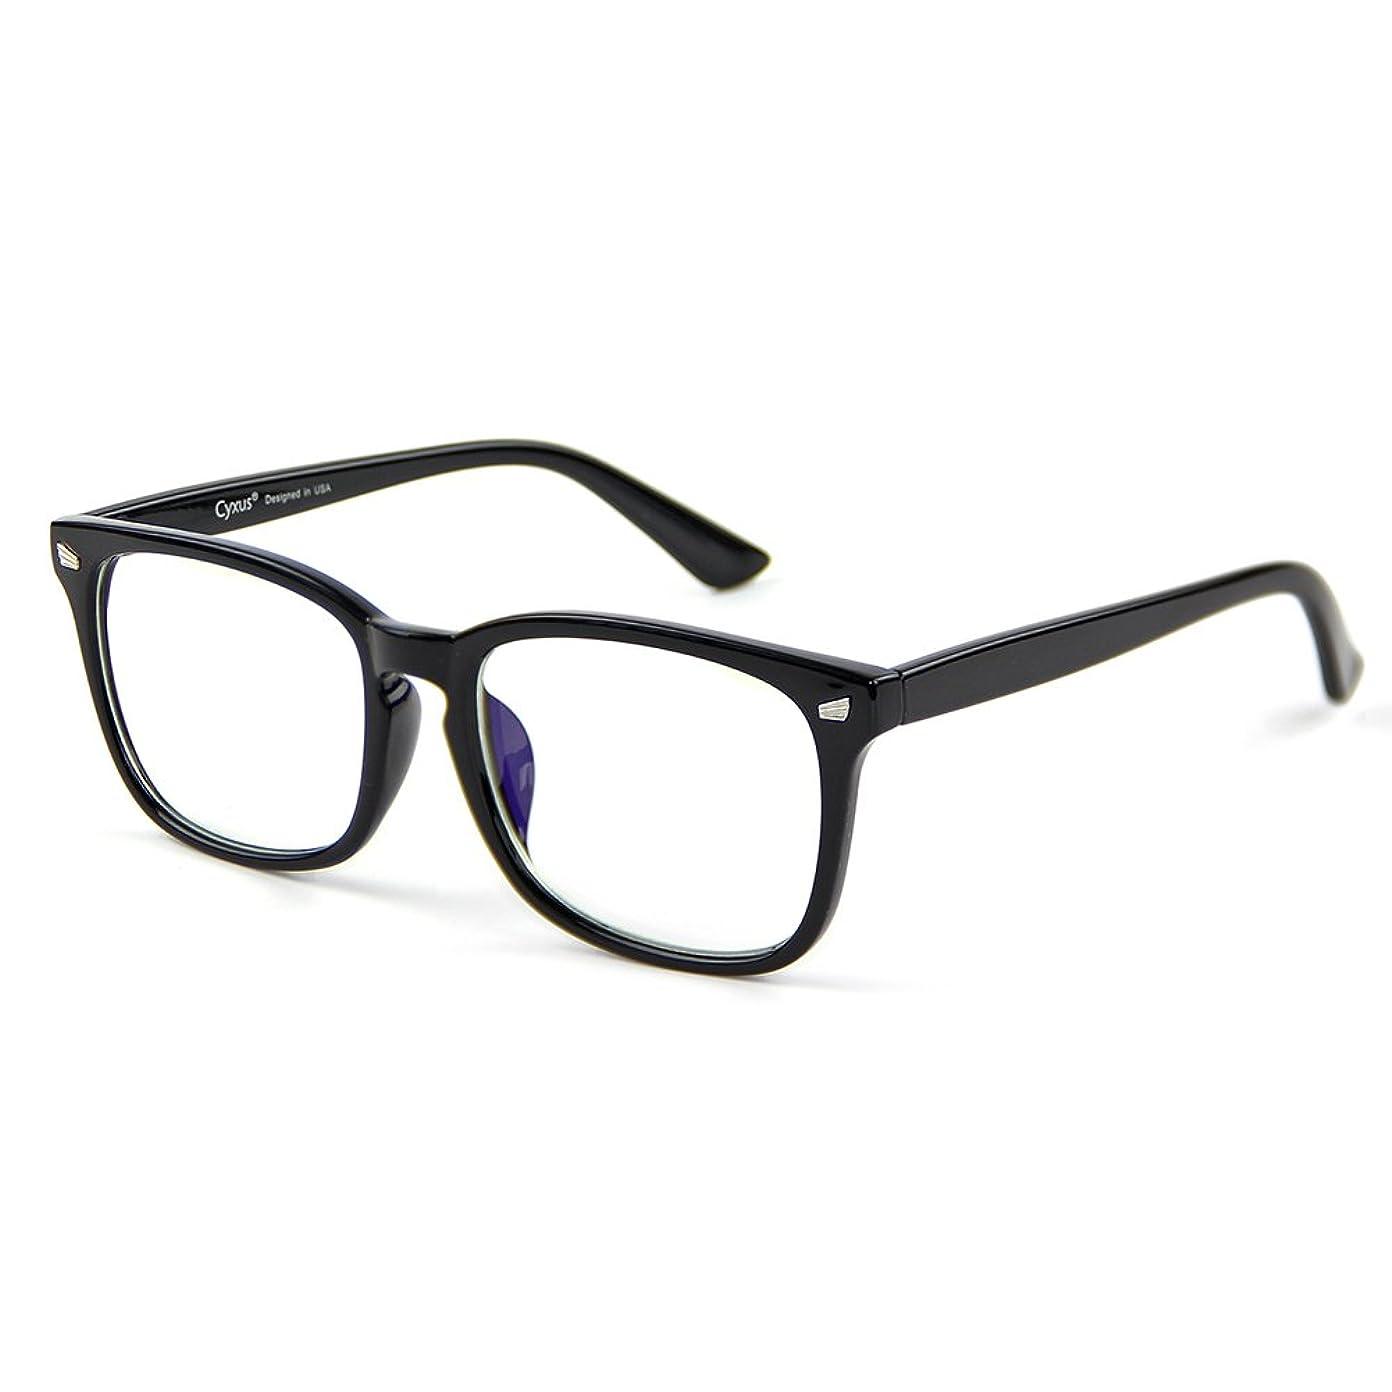 c5d8201e99db Cyxus Blue Light Filter Computer Glasses for Blocking UV Headache [Anti Eye  Eyestrain] Transparent